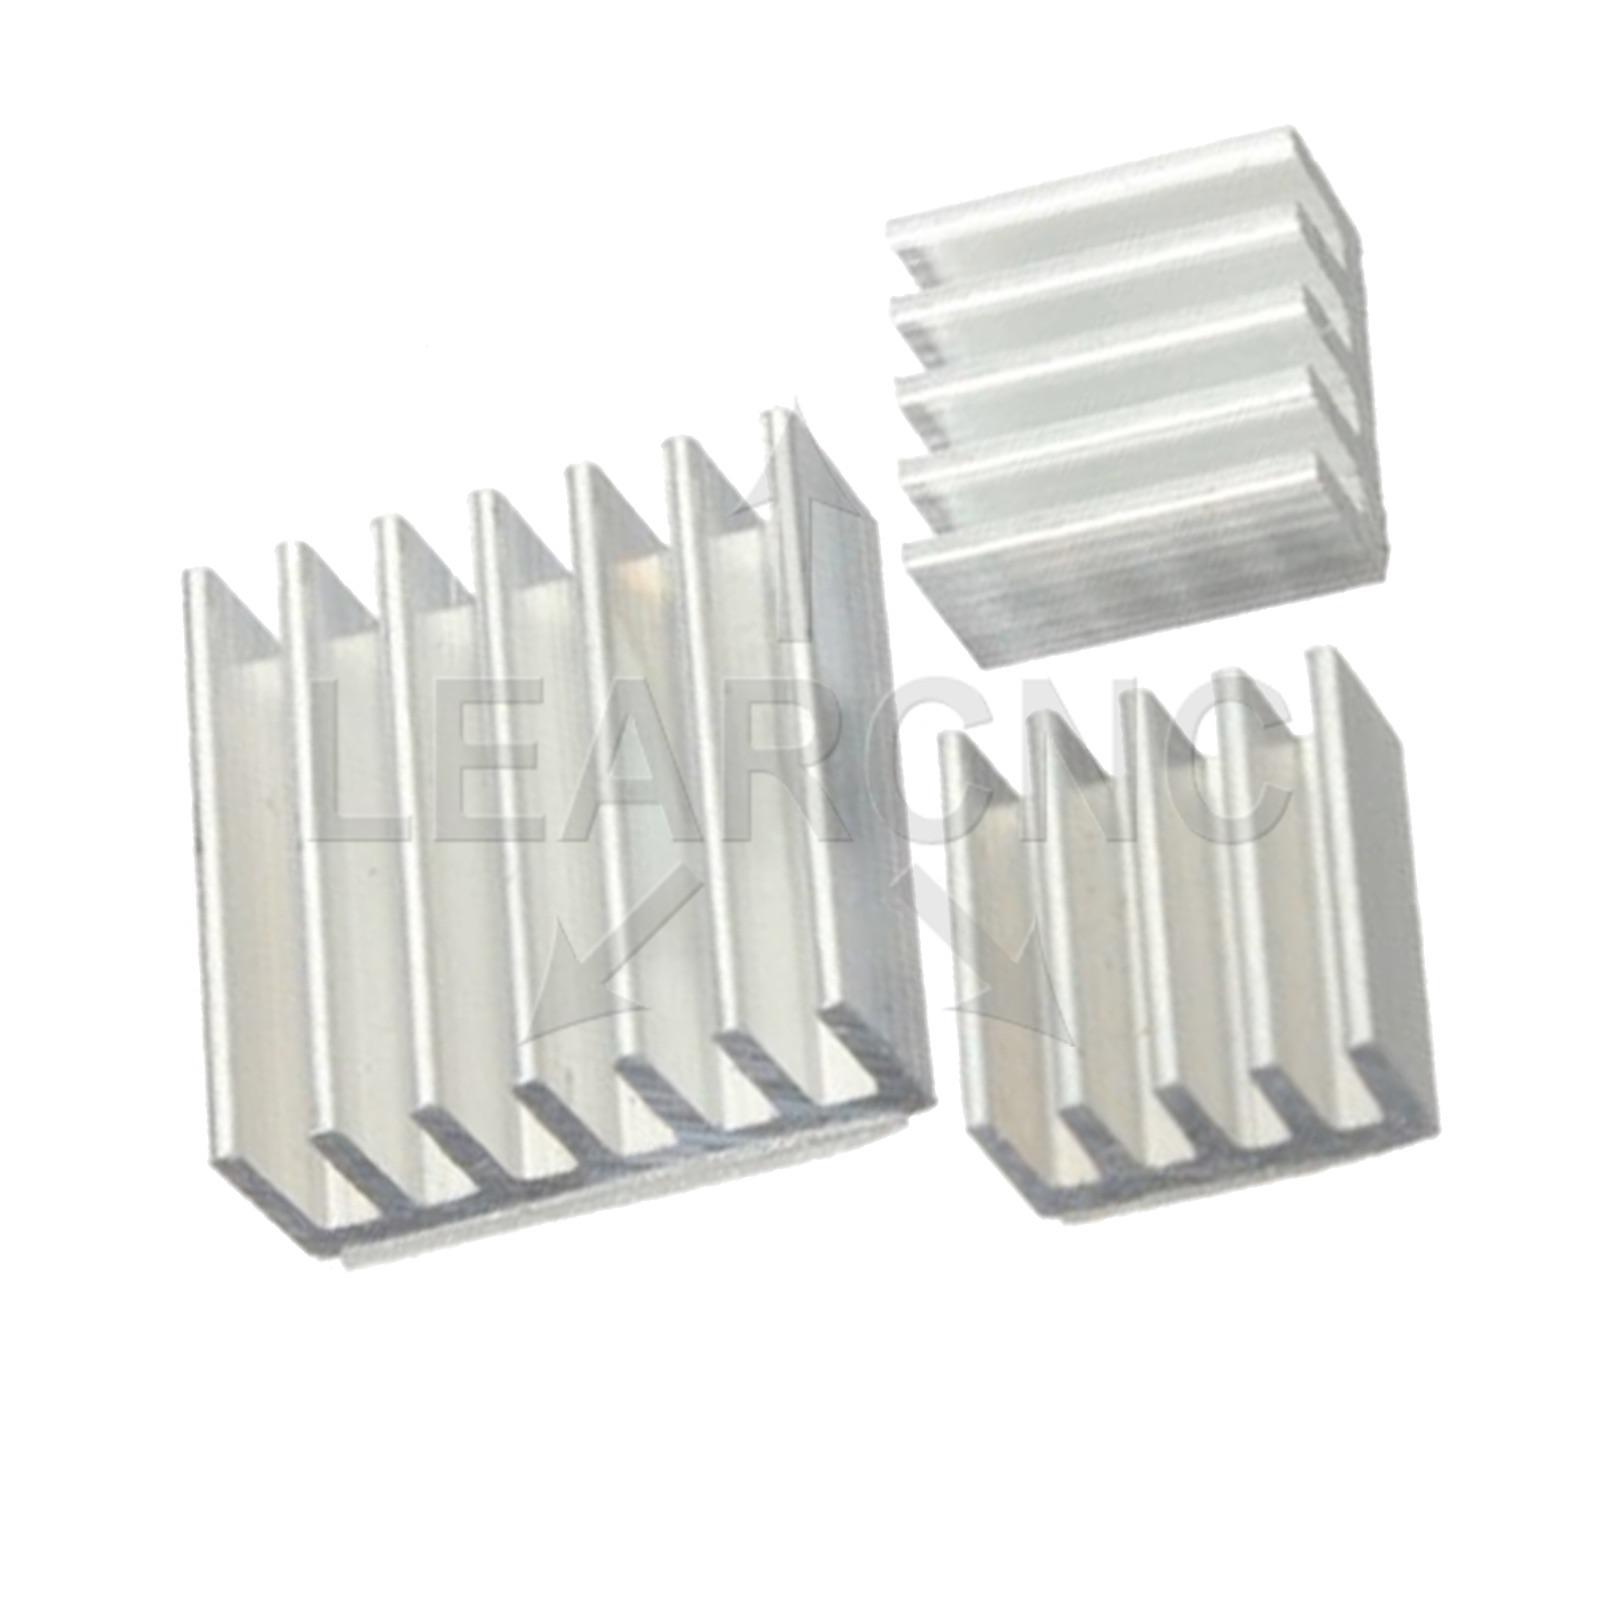 offering 100% for Raspberry Pi Adhesive Aluminum Heatsink